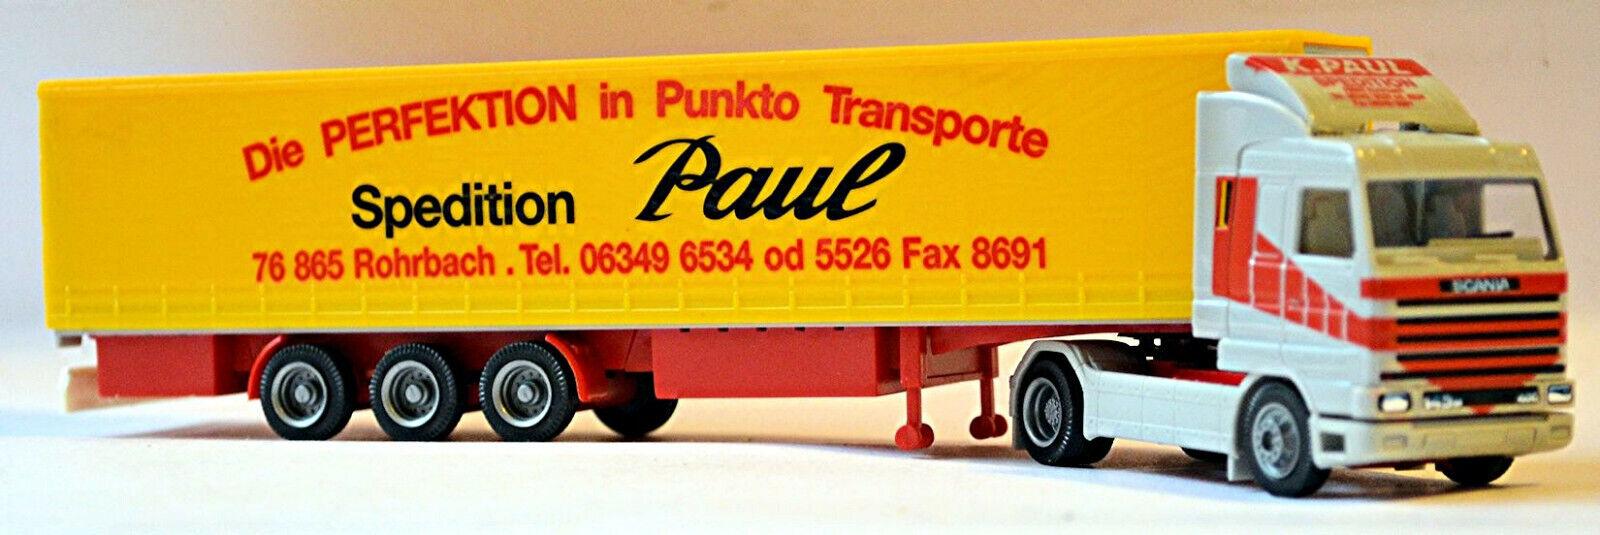 Scania 143 M Exp Exp 65533;65533; tradition Paul 76865 Rohrbah Rideau Sz 1 87 Albedo 295010